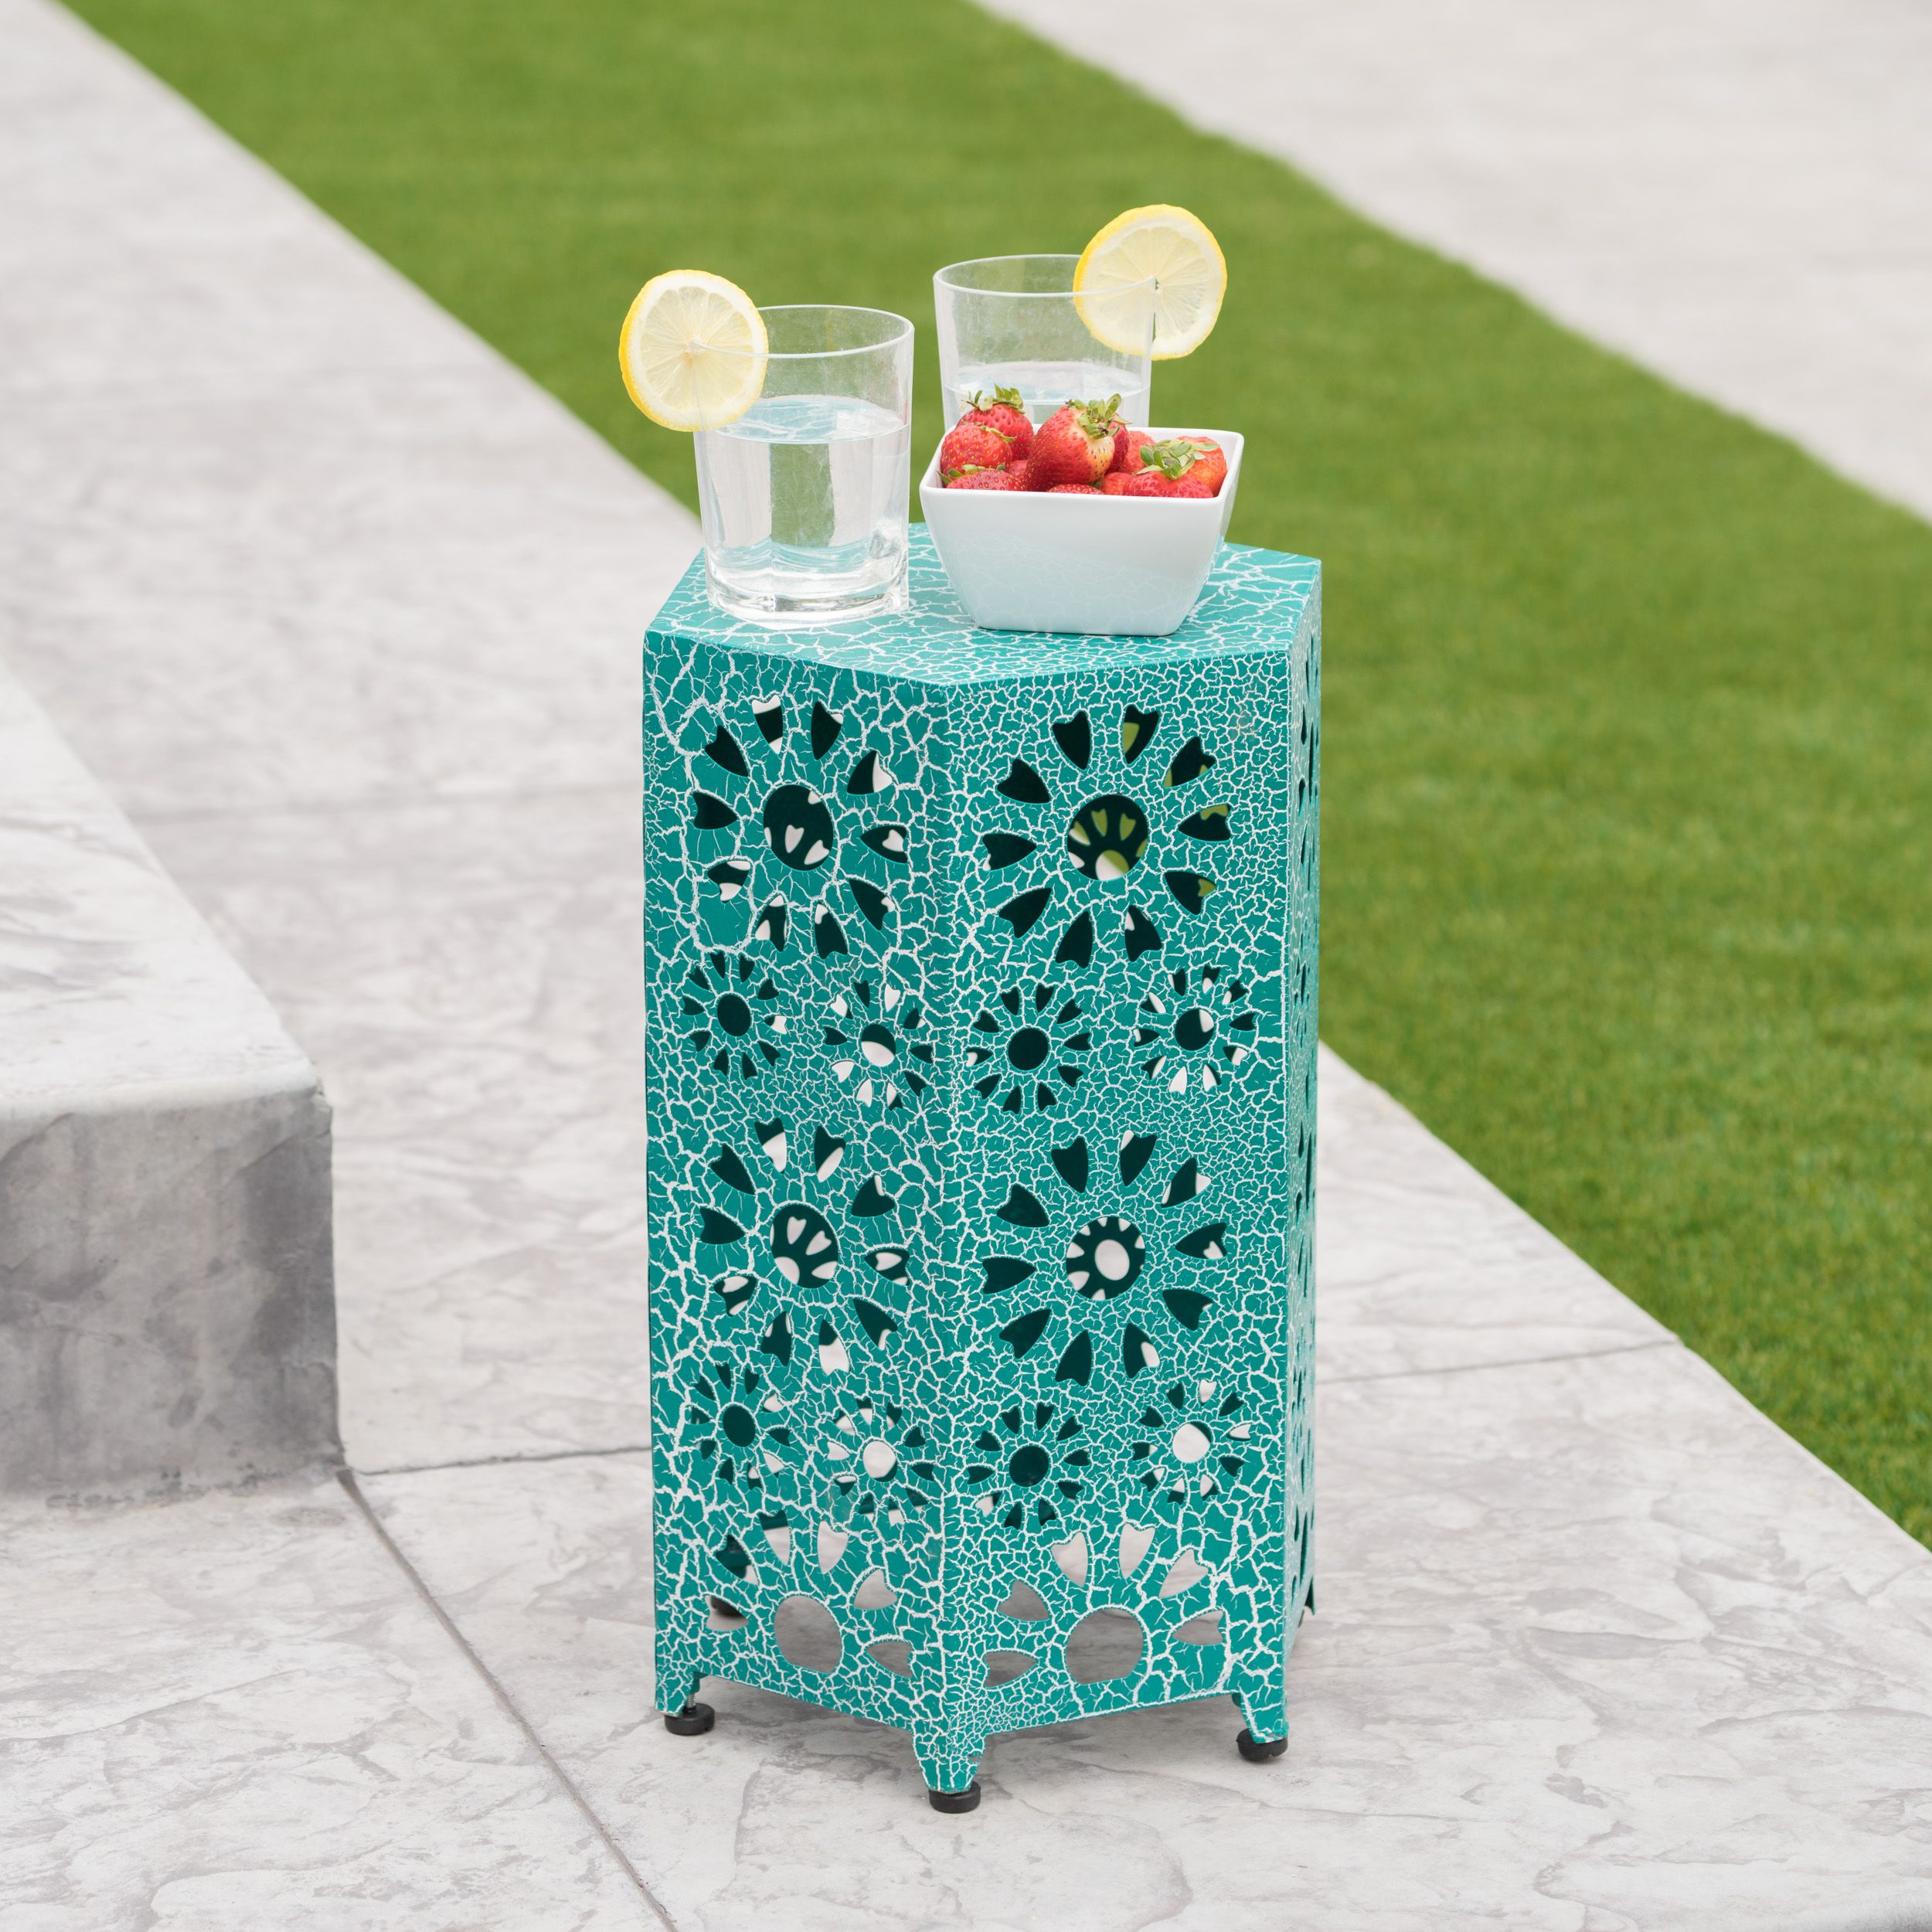 Download Wallpaper Walmart Outdoor Patio Side Tables